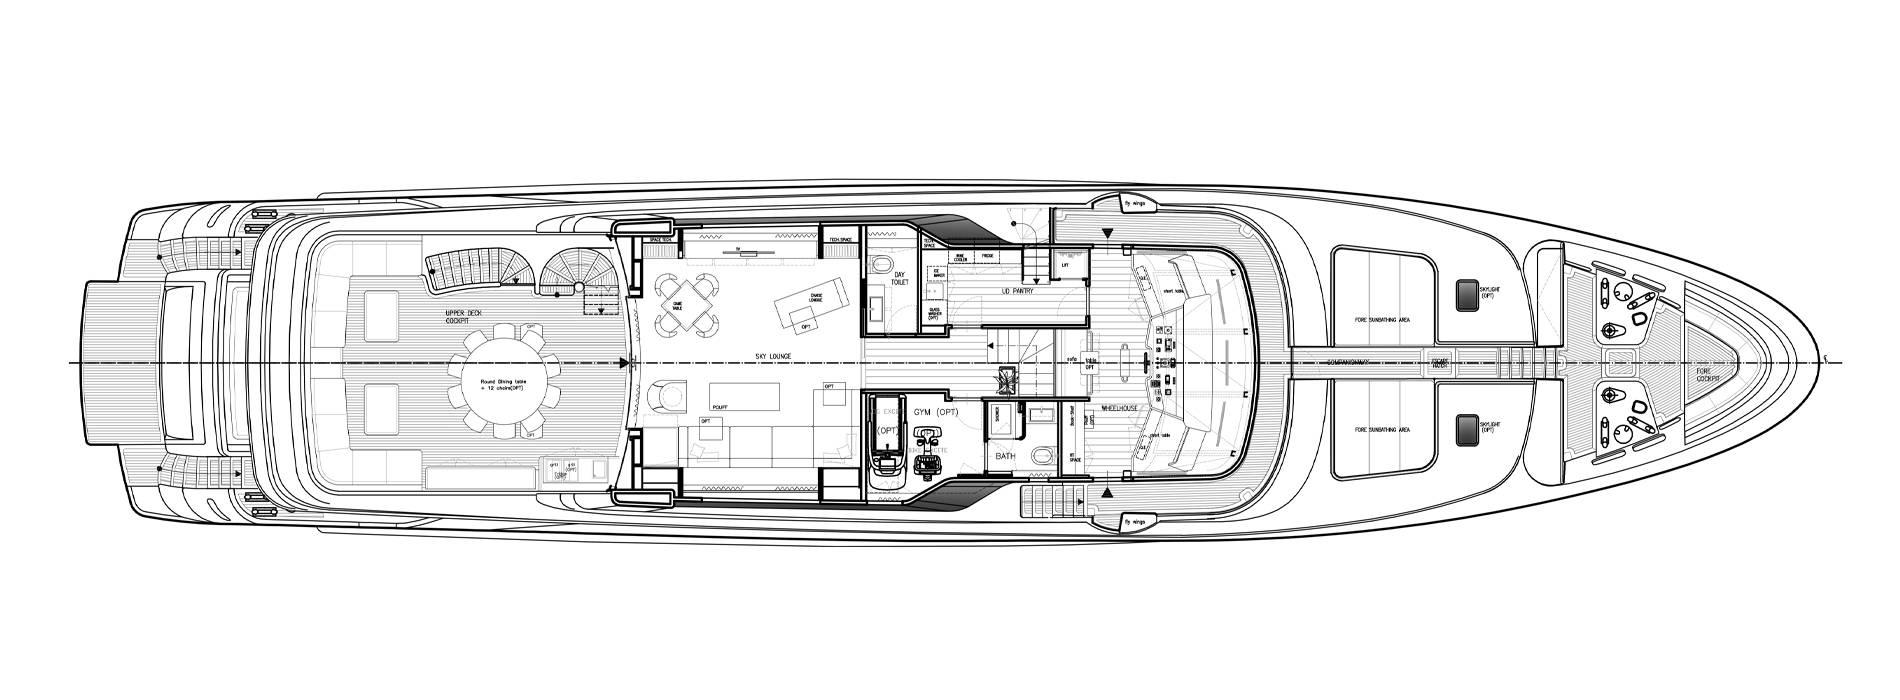 Sanlorenzo Yachts SD122-27 under offer 頂層甲板